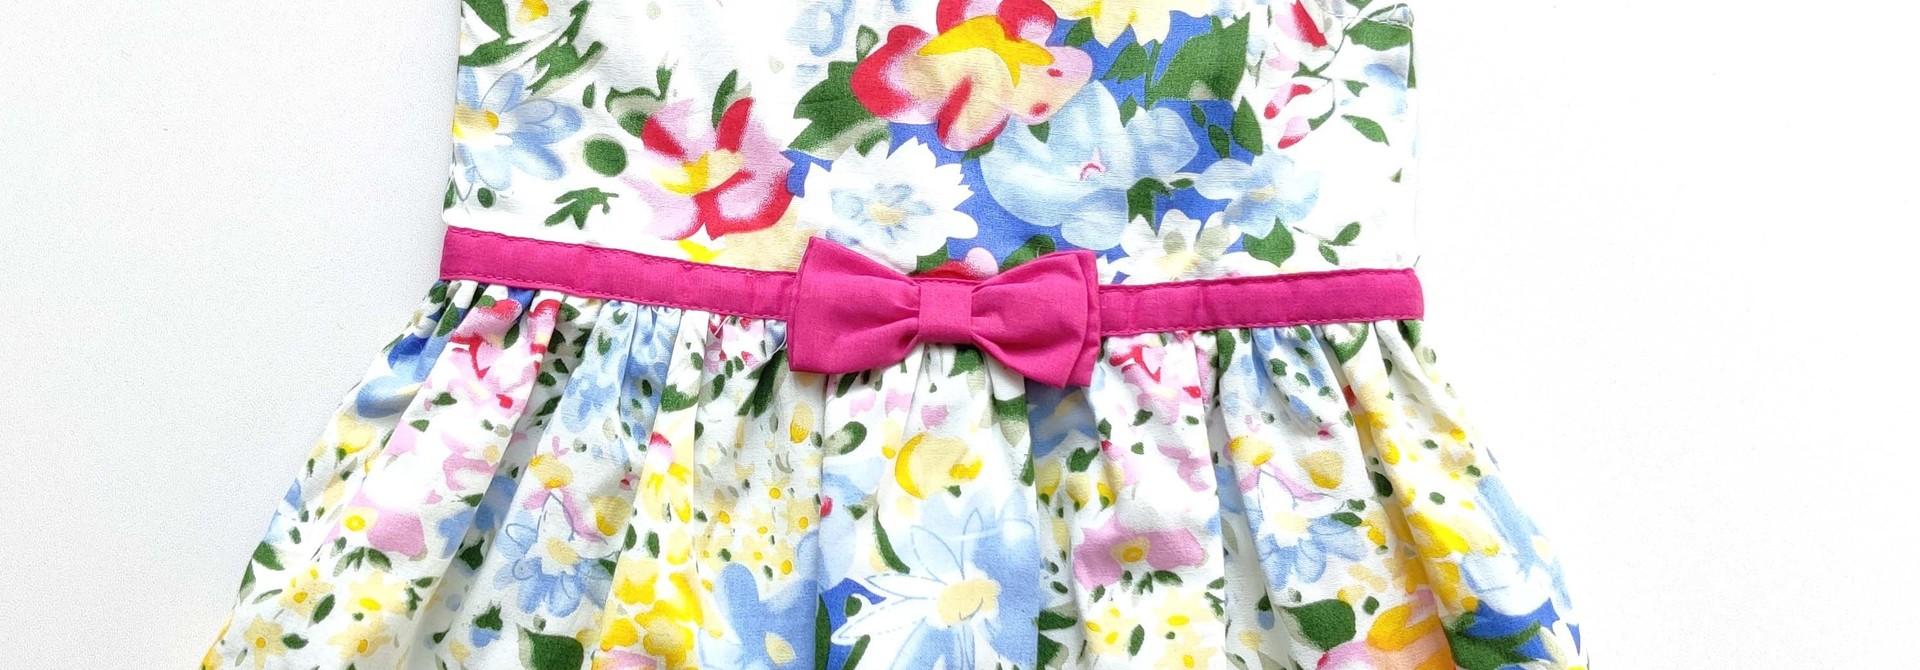 Nieuwe jurk Knot so bad